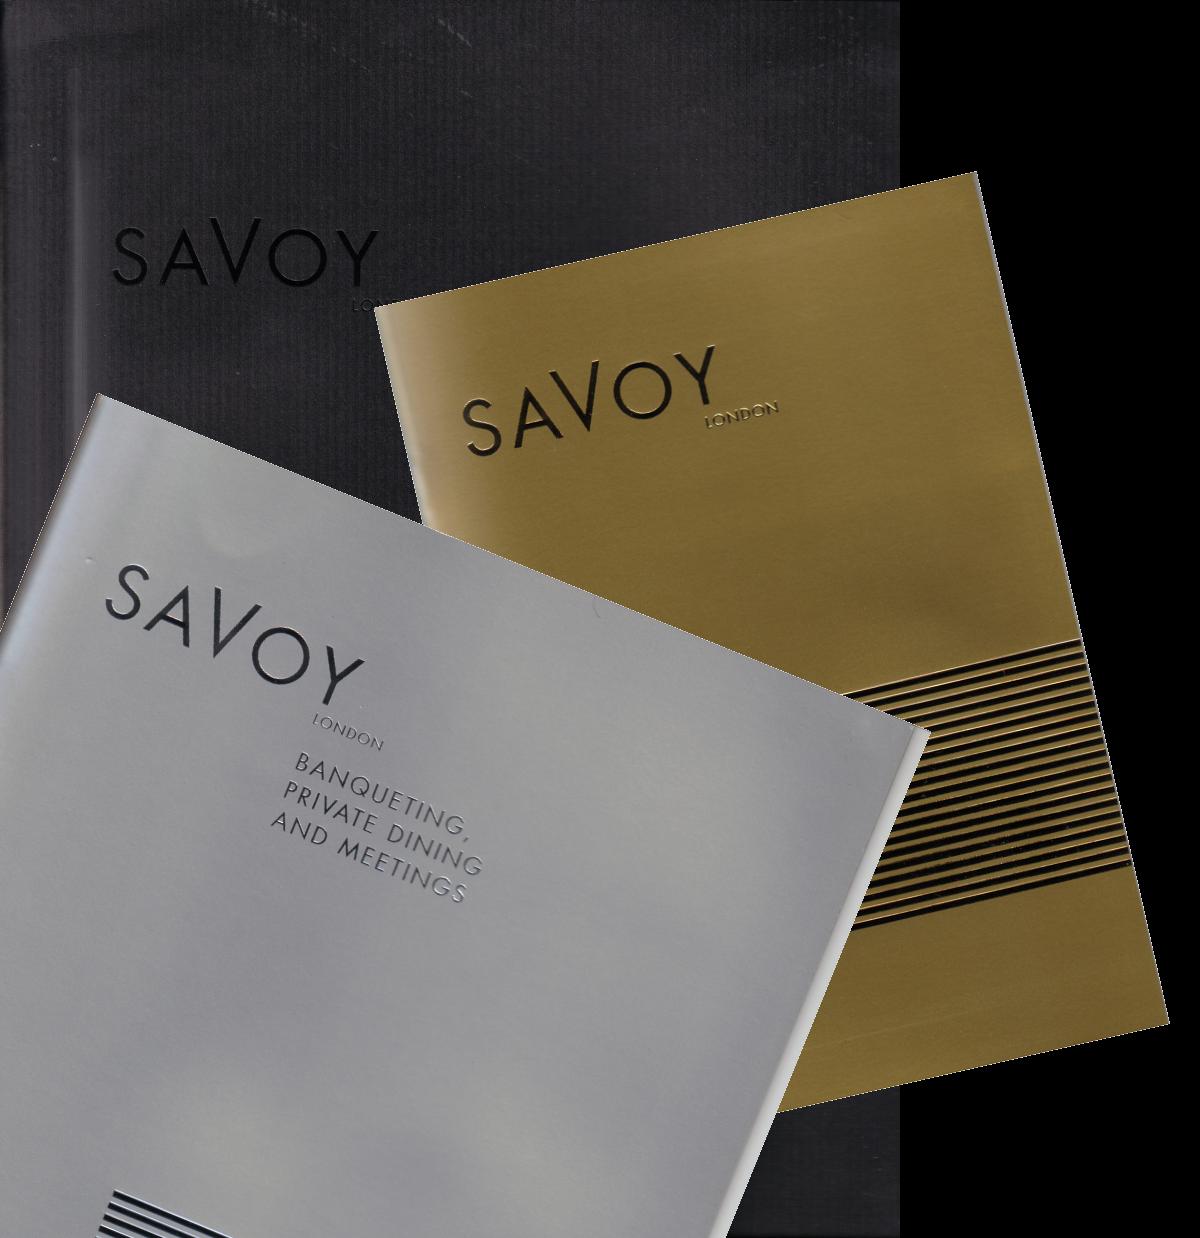 Savoy brochures